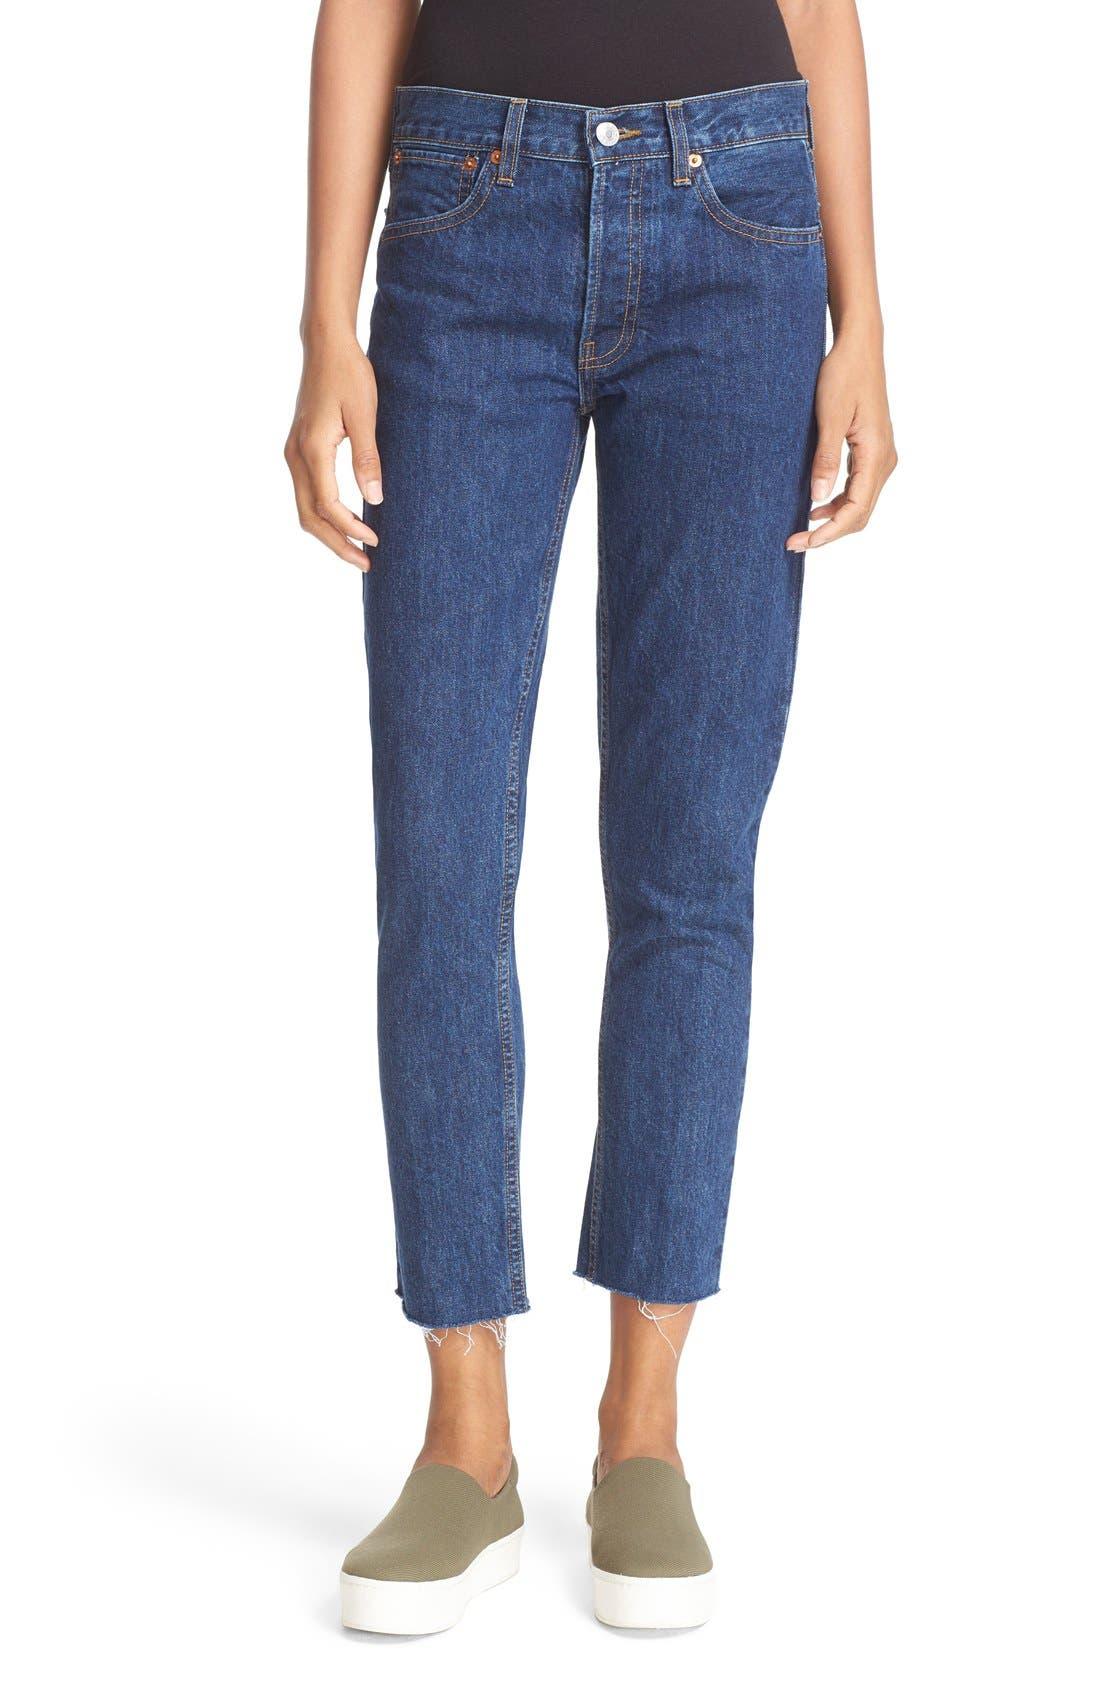 Originals High Waist Crop Jeans,                         Main,                         color, 400